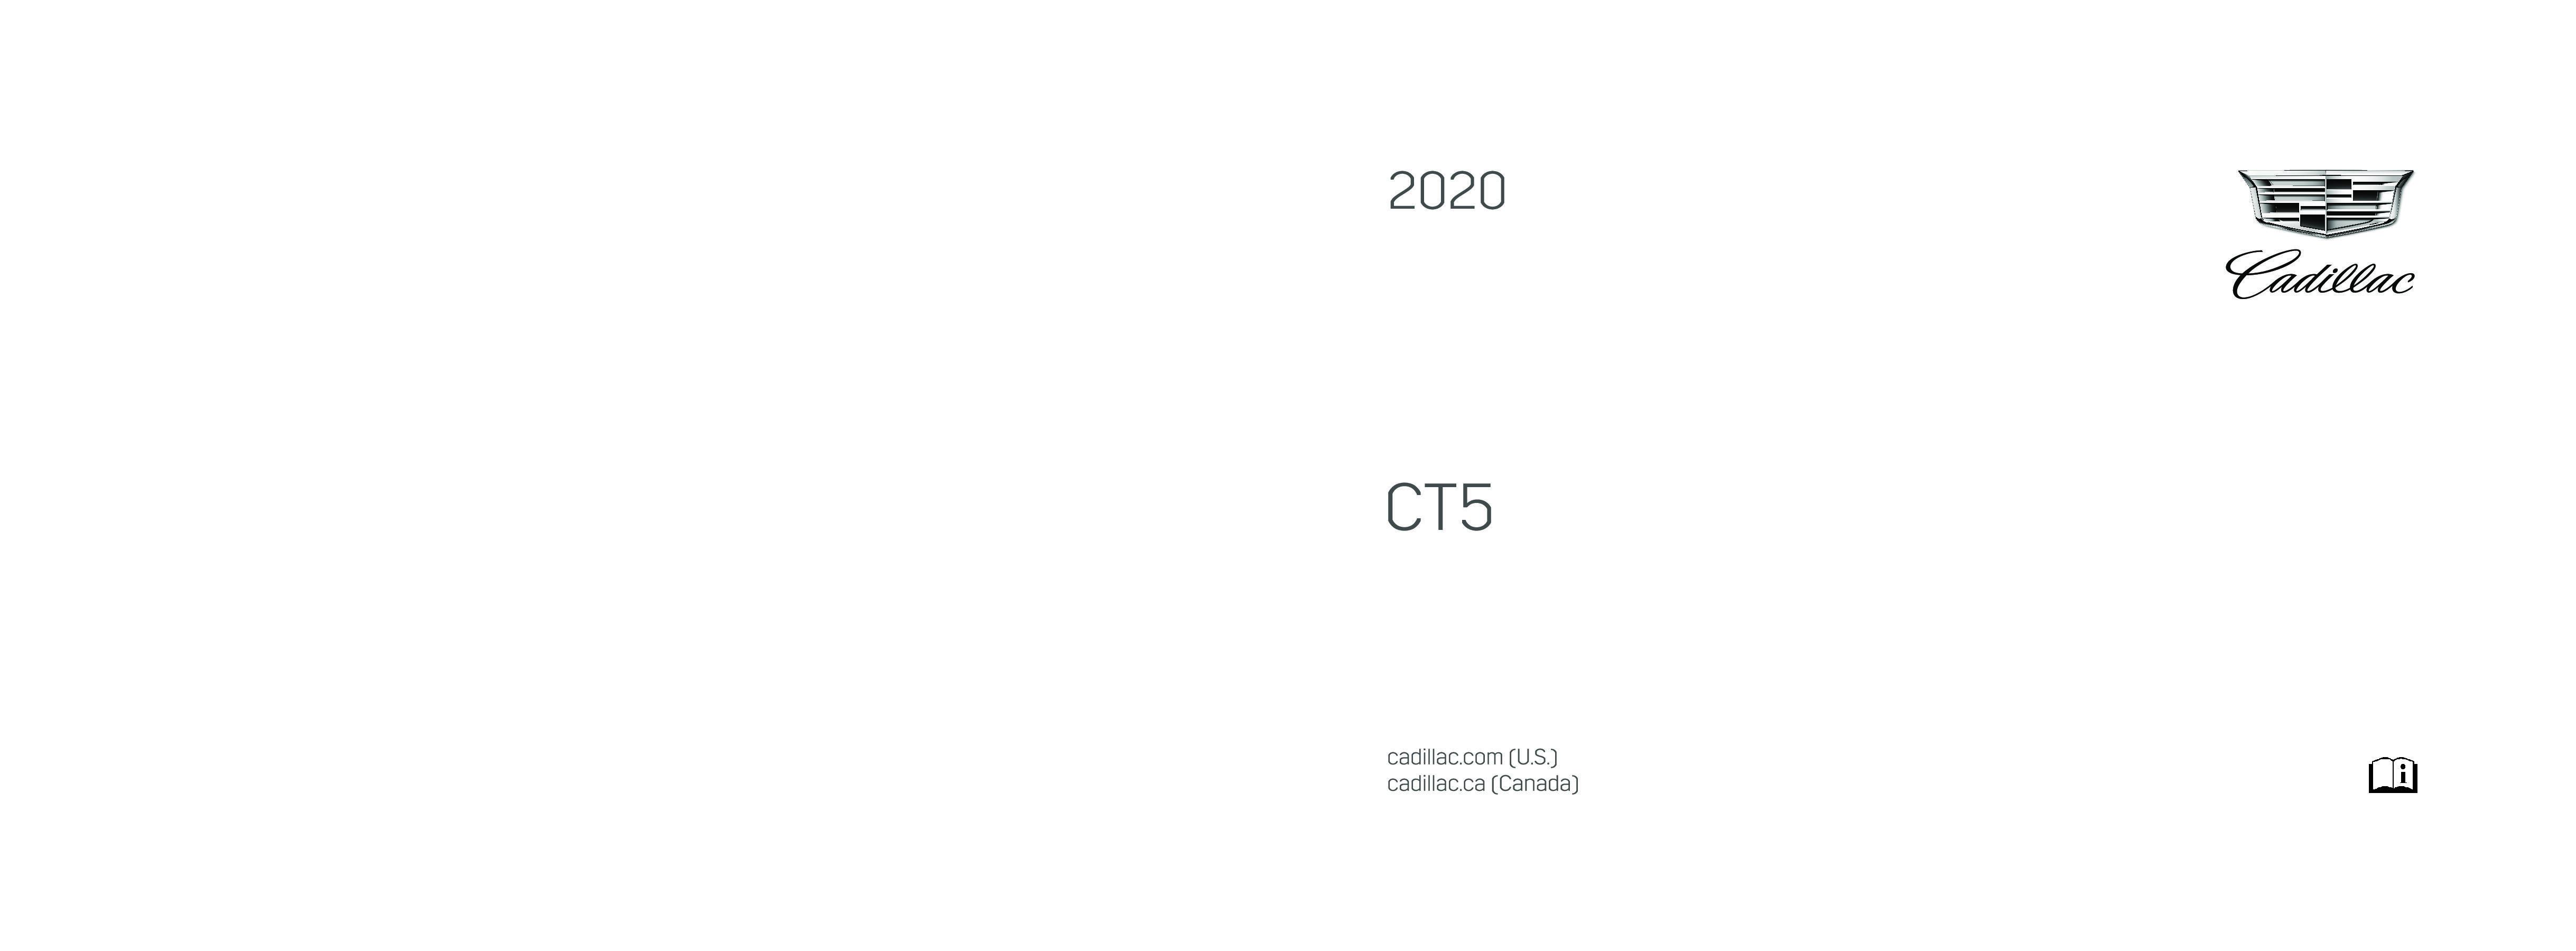 2020 Cadillac Ct5 owners manual